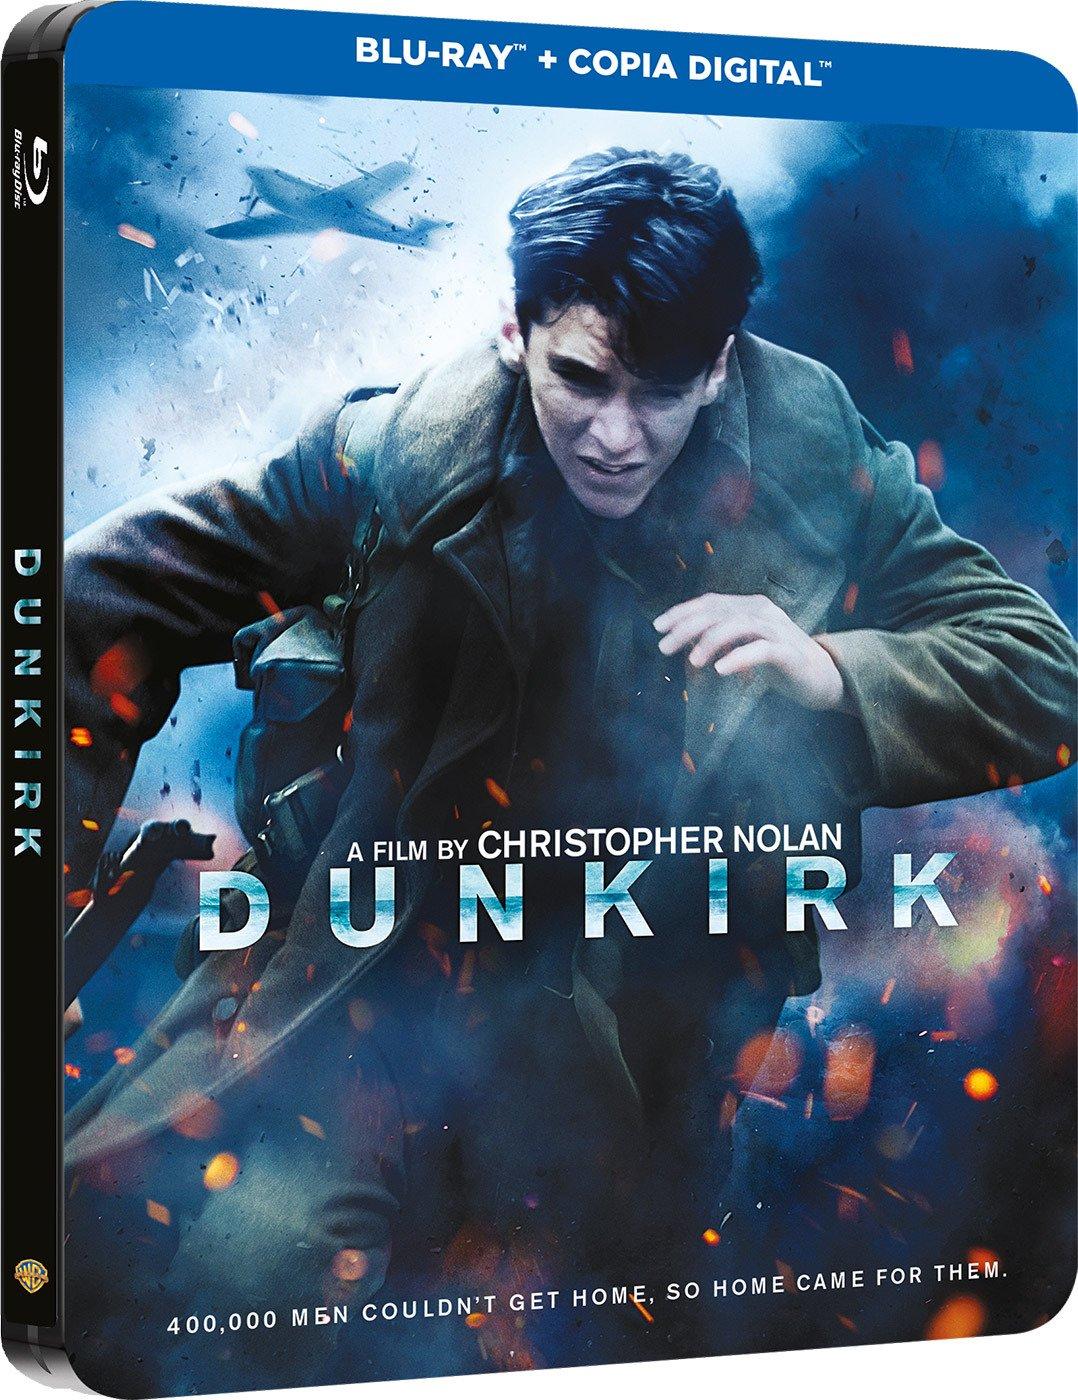 Dunkerque Blu-Ray Steelbook [Blu-ray]: Amazon.es: Fionn Whitehead, Barry Keoghan, Mark Rylance, Tom Hardy, Kenneth Branagh, Christopher Nolan, Fionn Whitehead, Barry Keoghan: Cine y Series TV